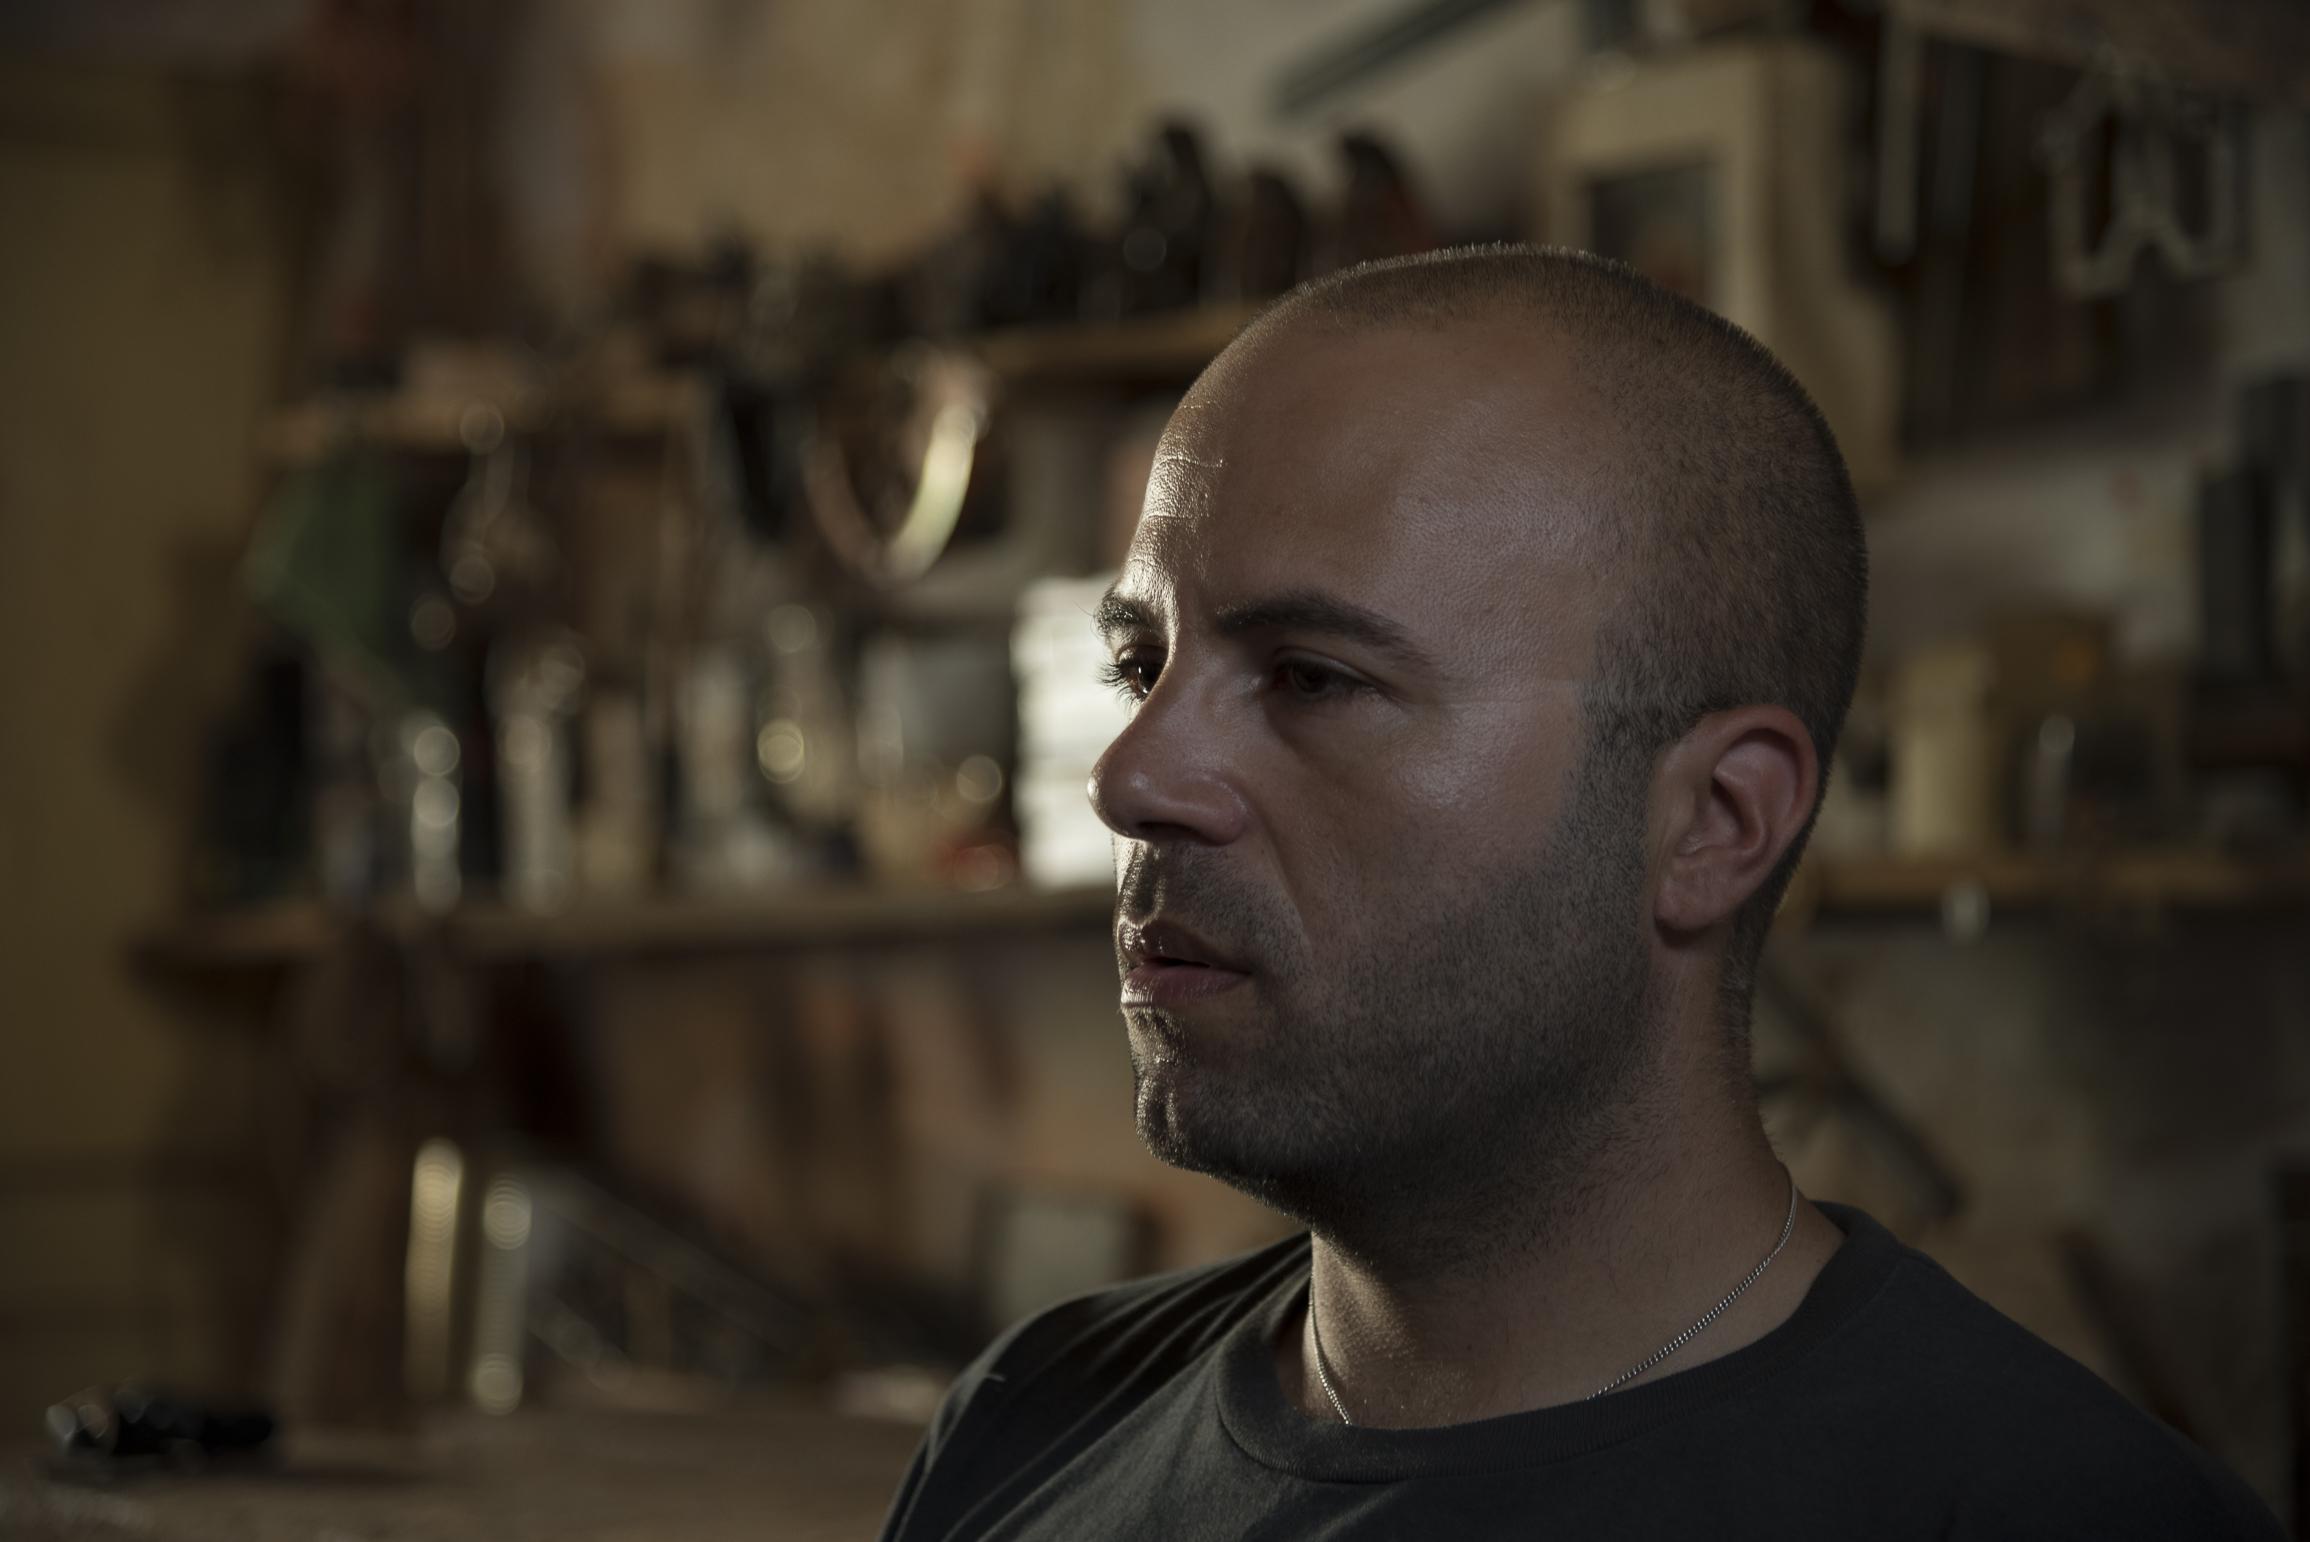 Qala Joseph Calleja by David Cass